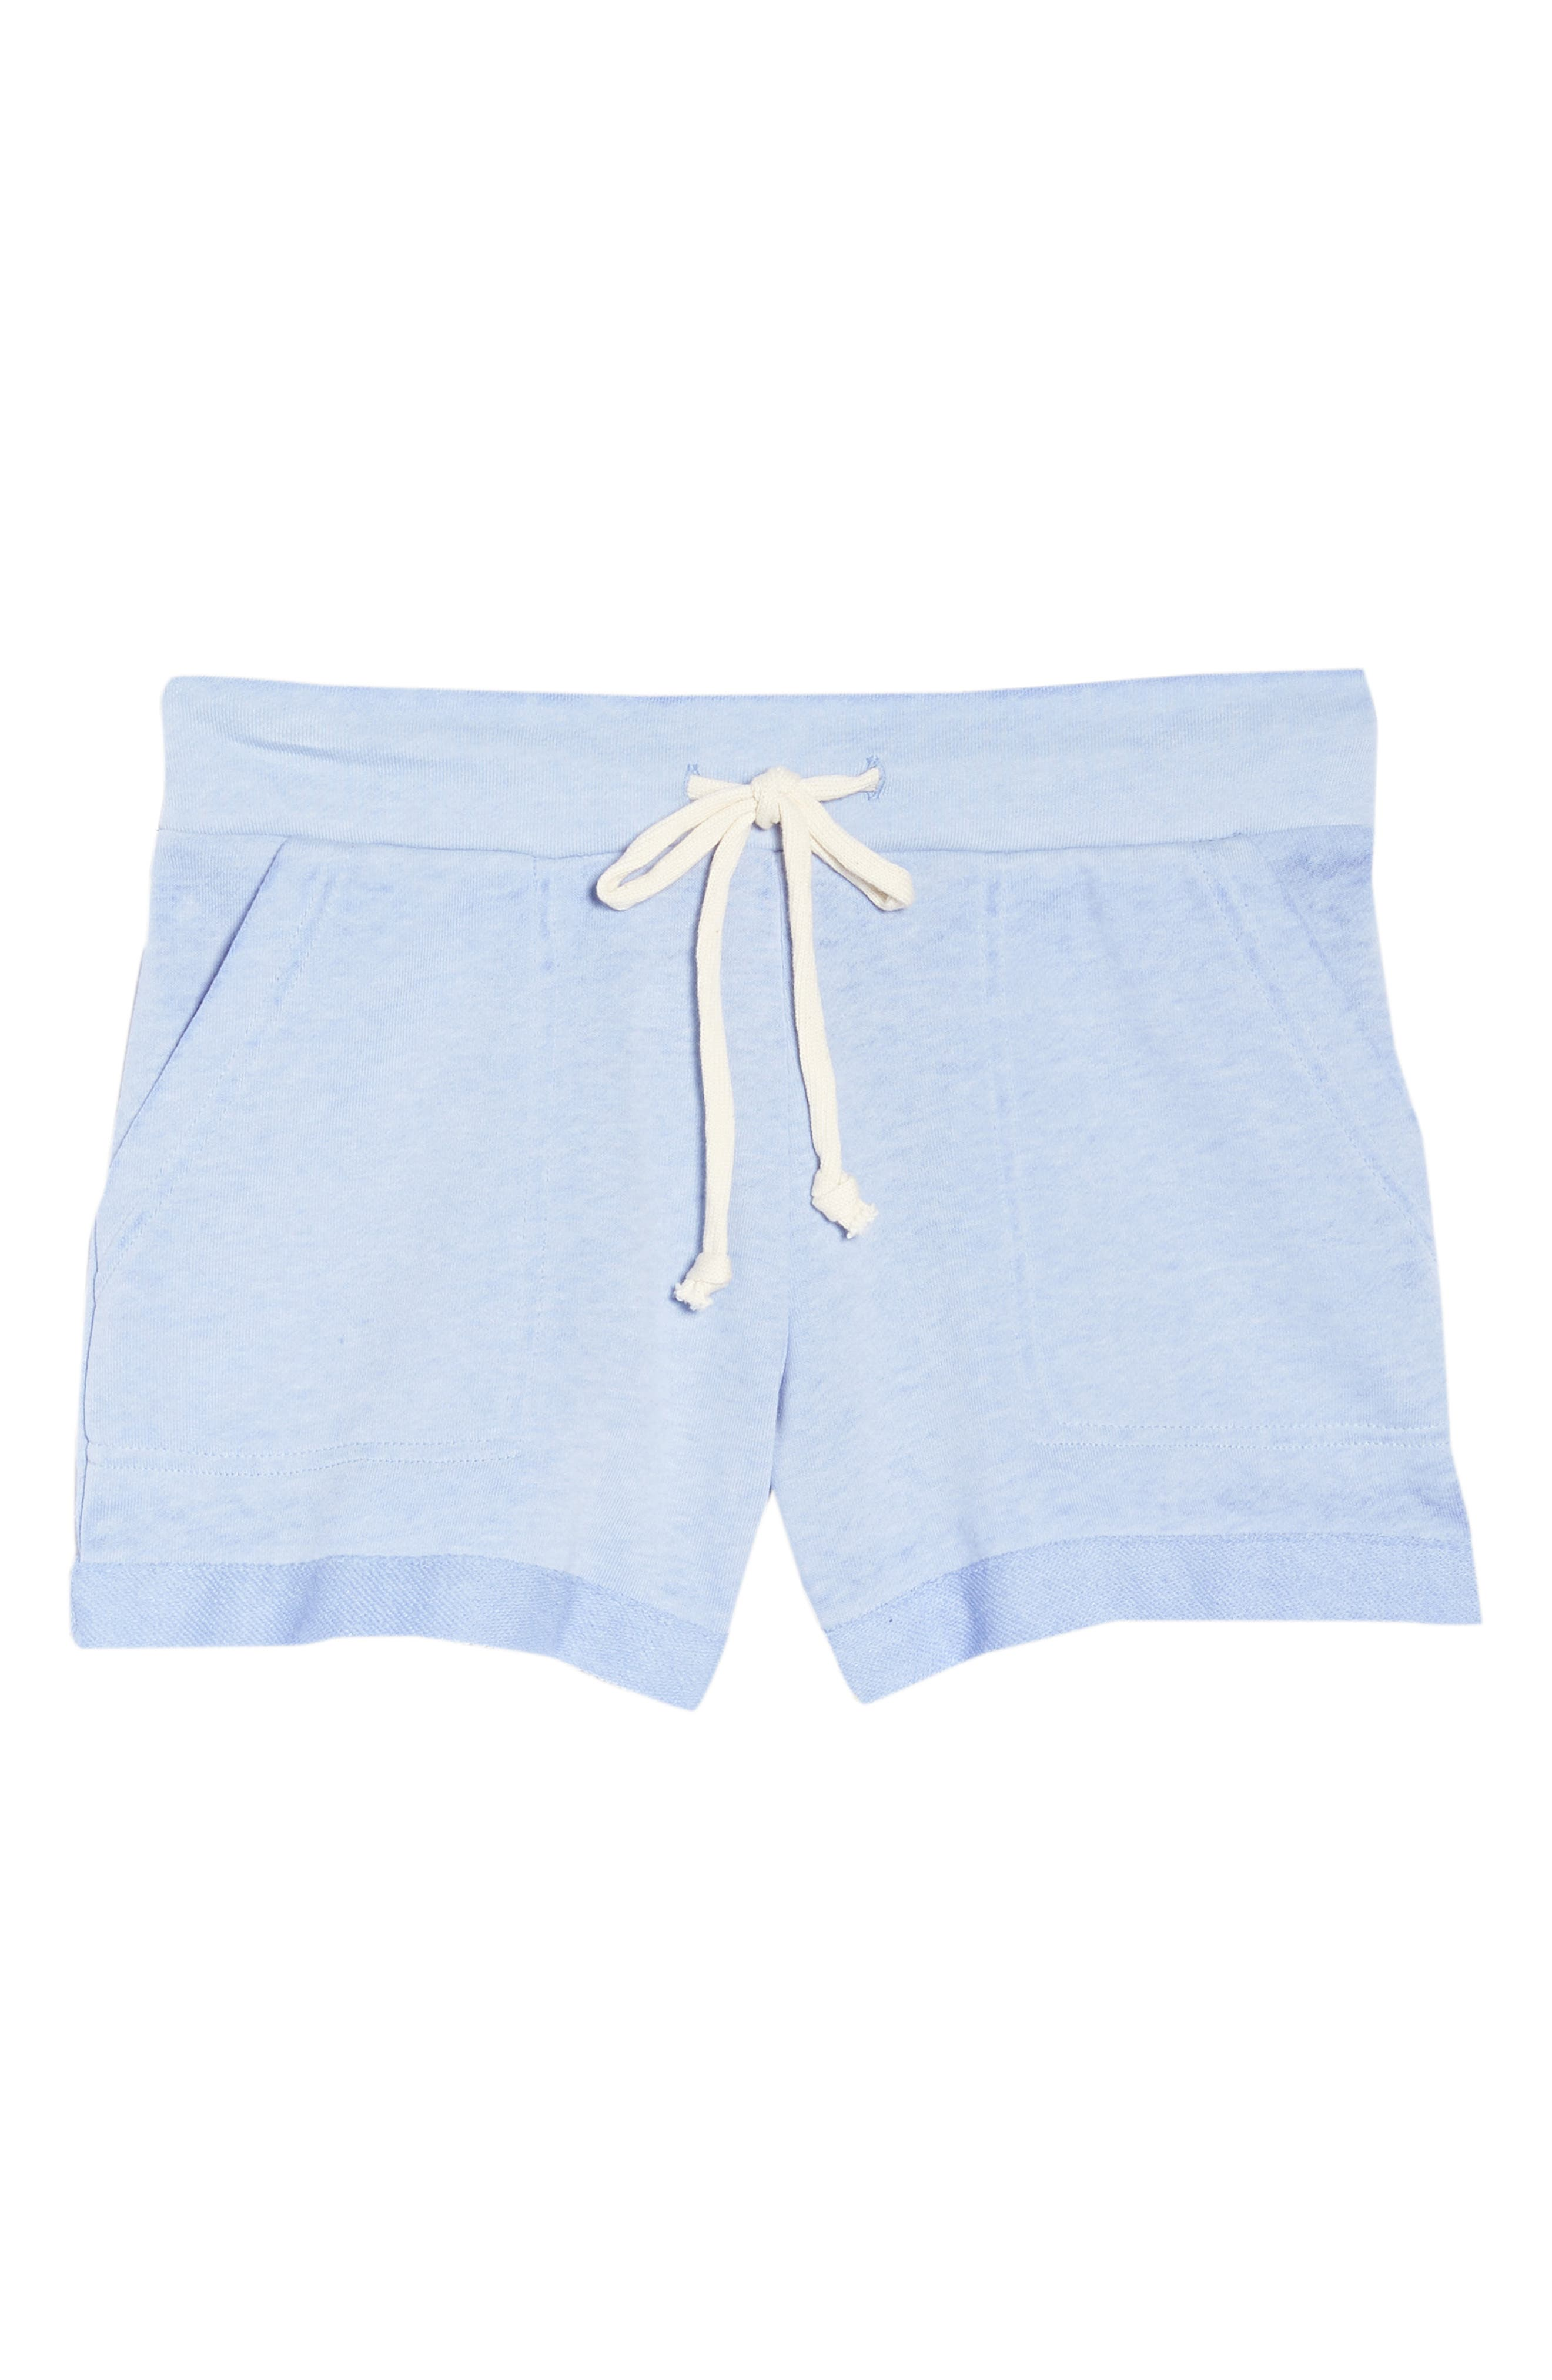 Lounge Shorts,                             Alternate thumbnail 4, color,                             Lavender Lustre